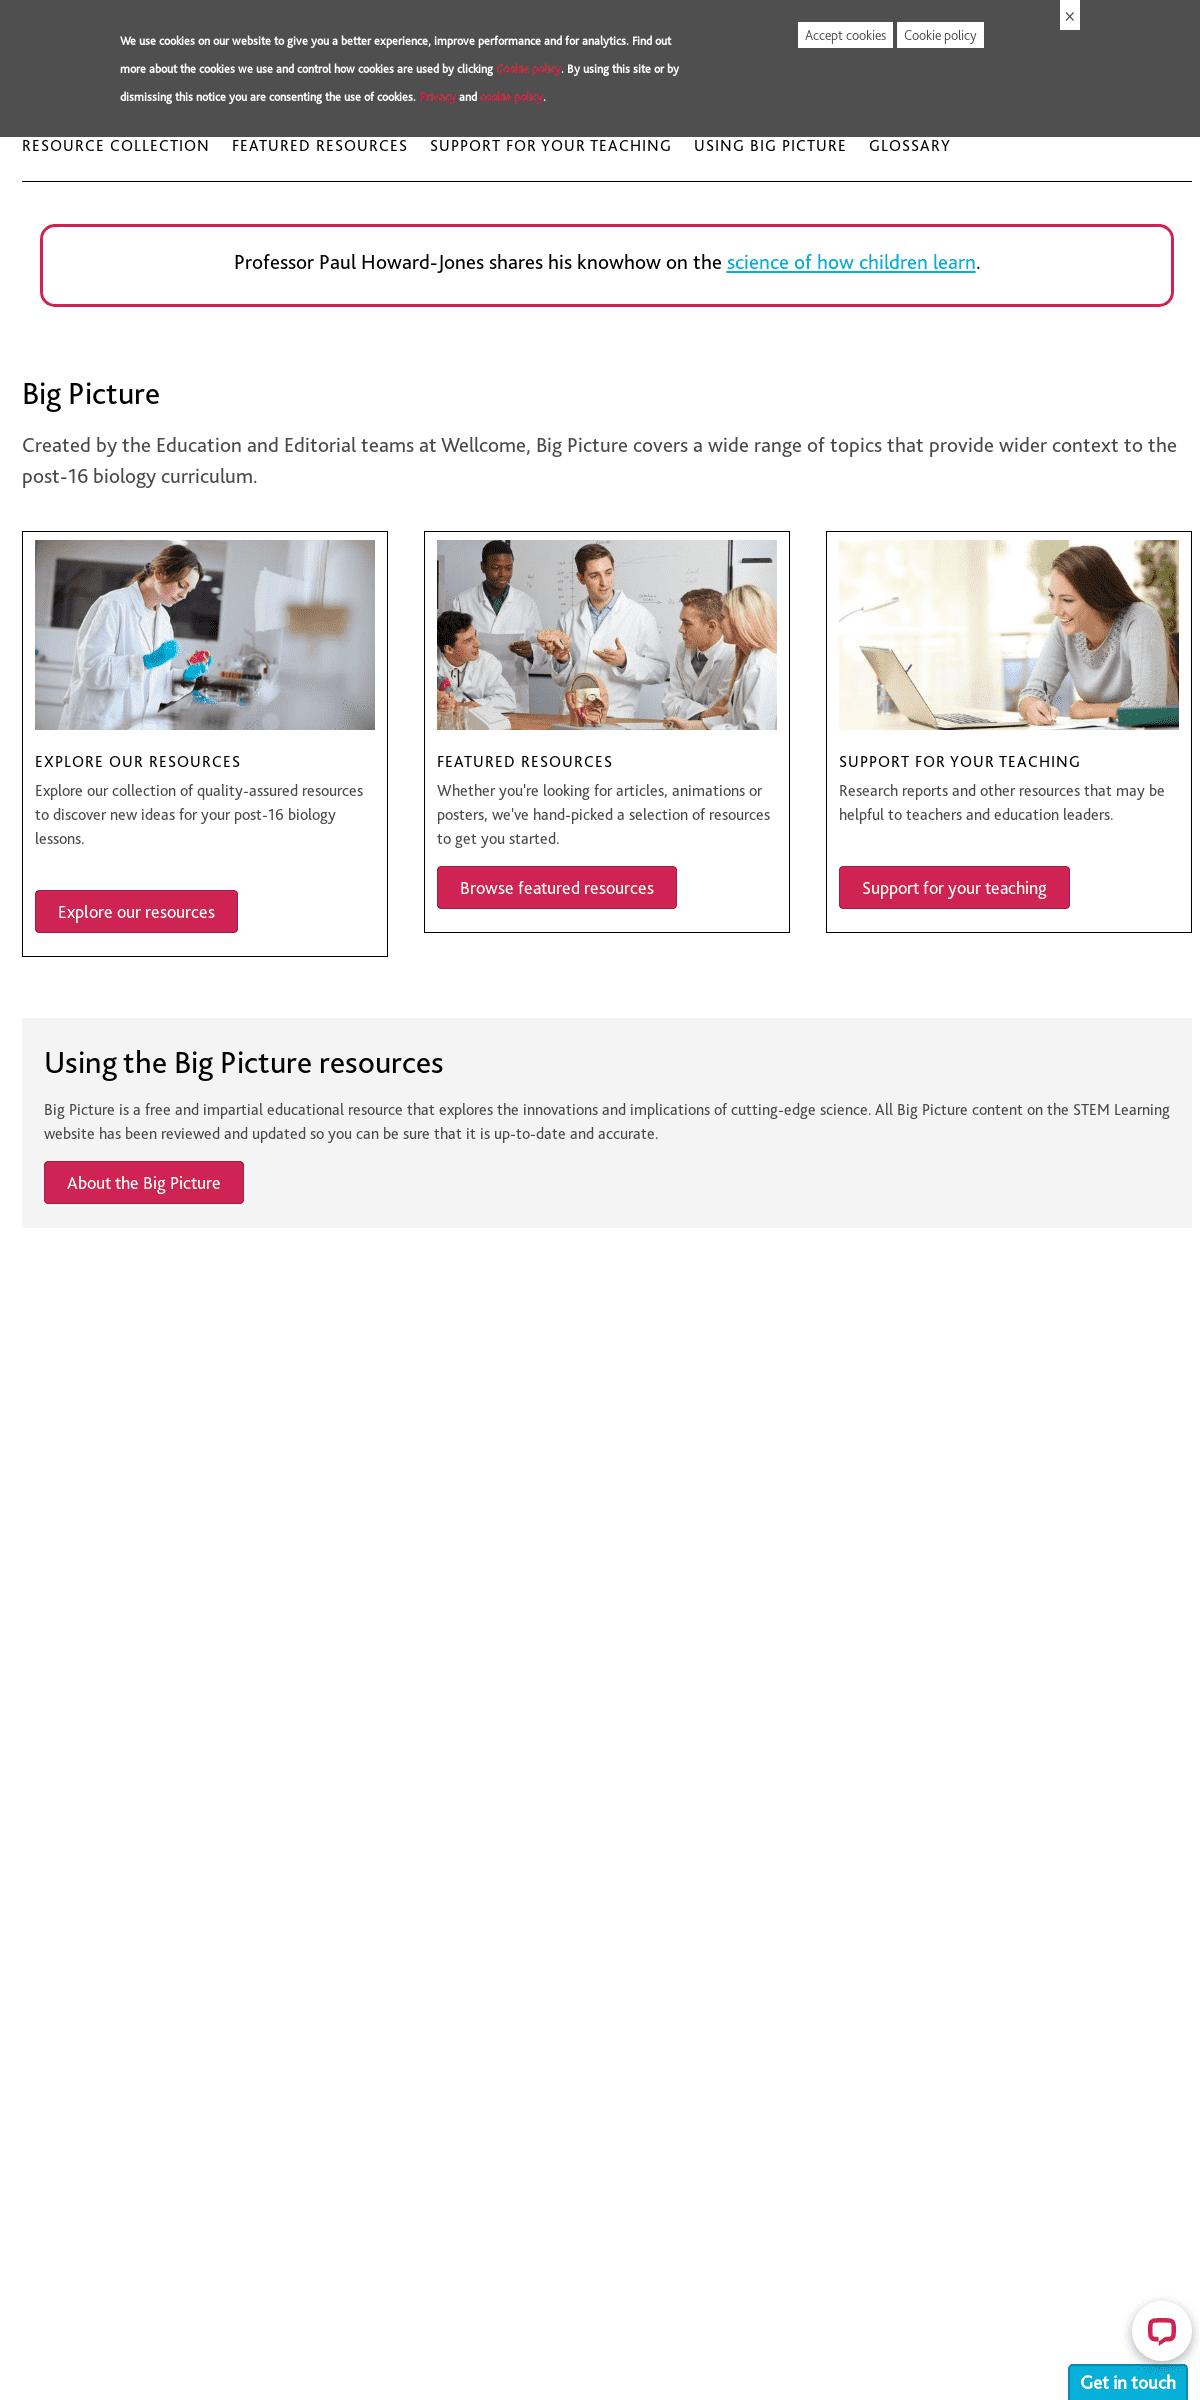 ArchiveBay.com - bigpictureeducation.com - Big Picture - STEM